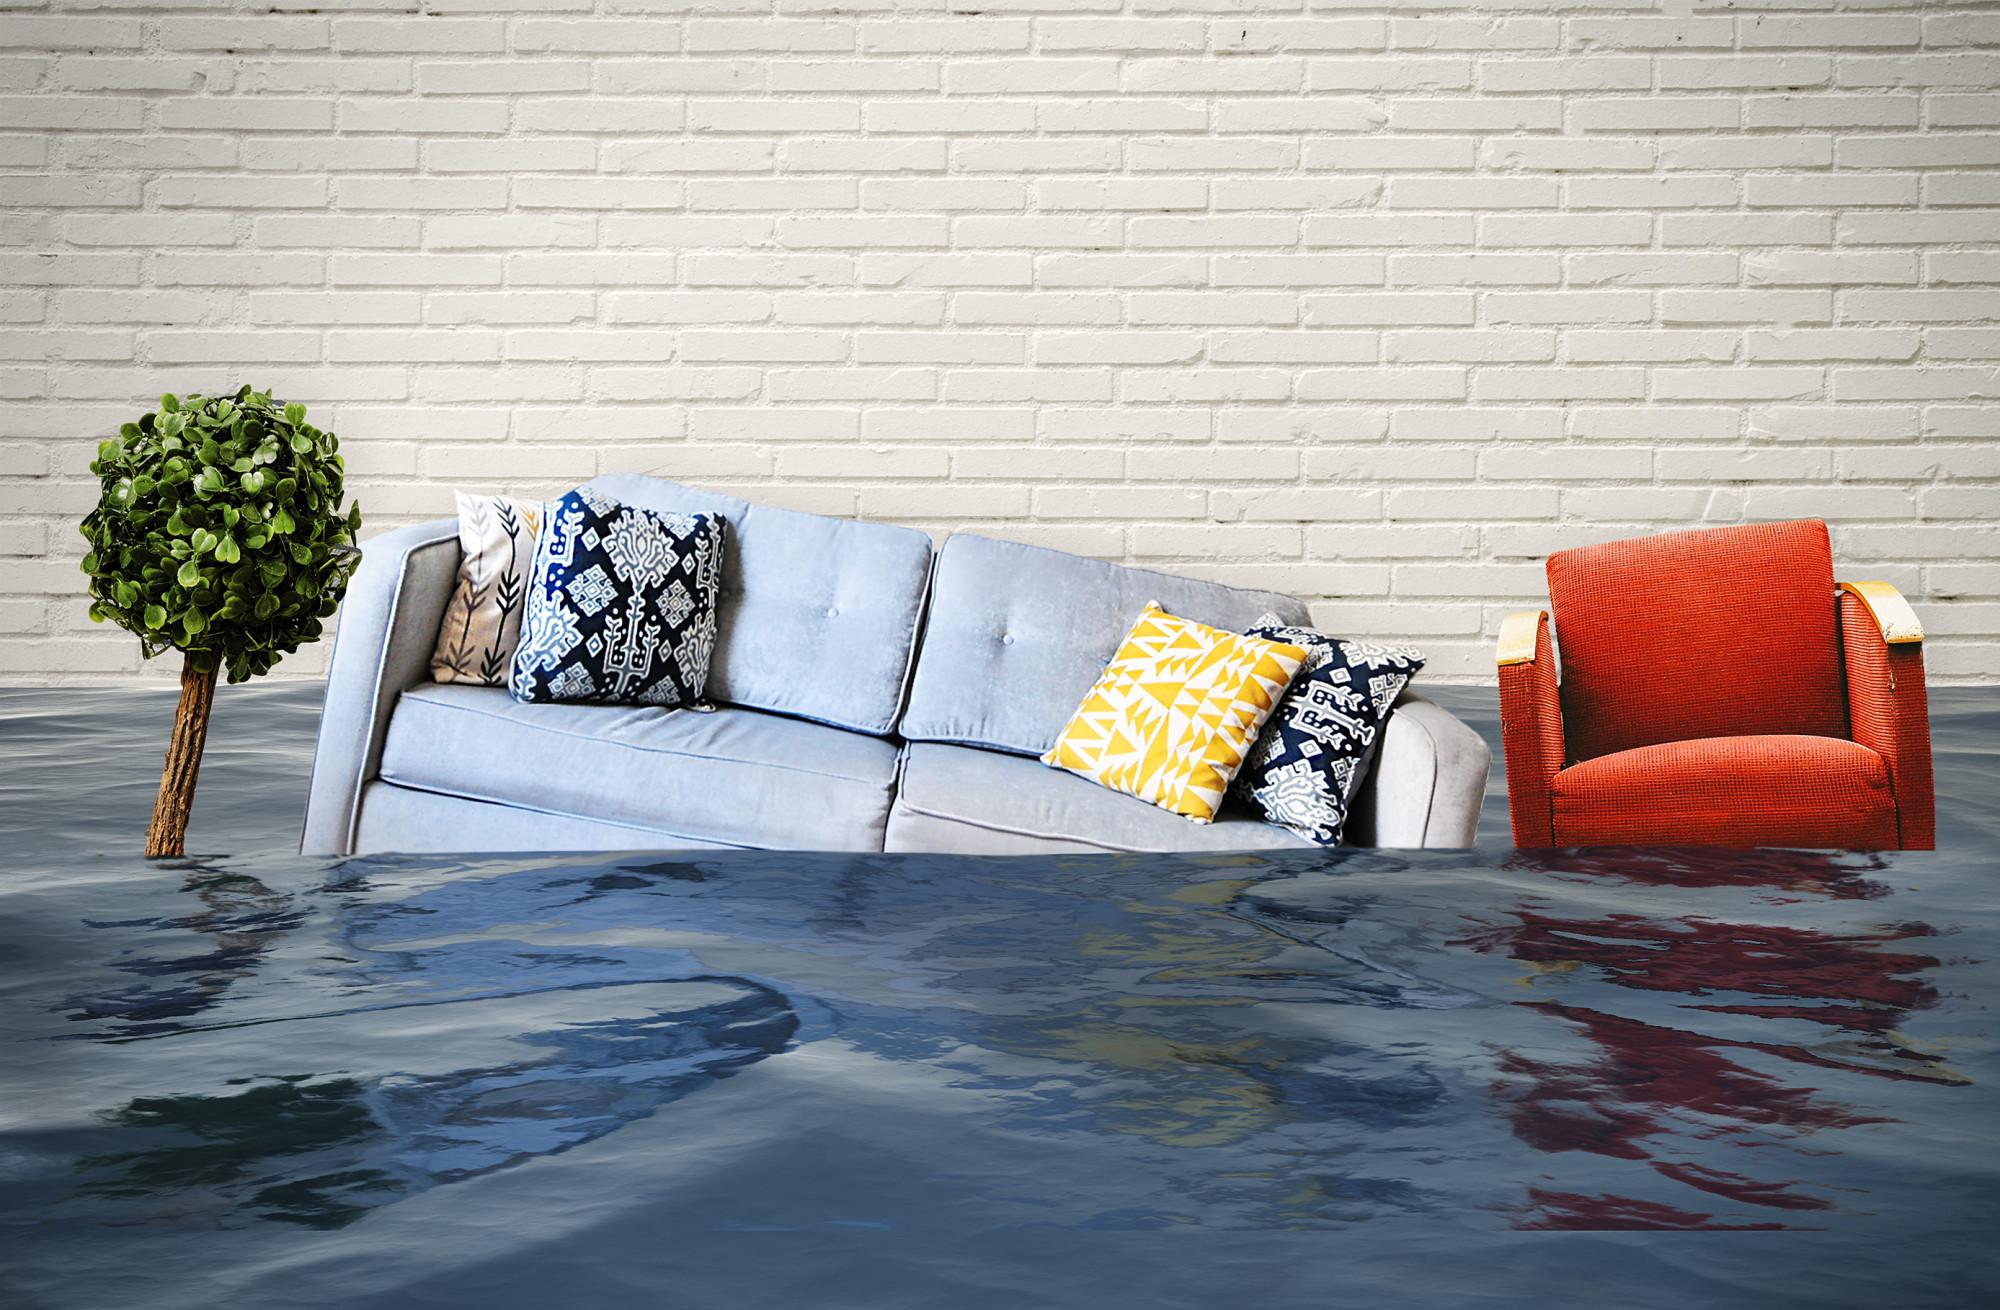 Water damage vie flooding